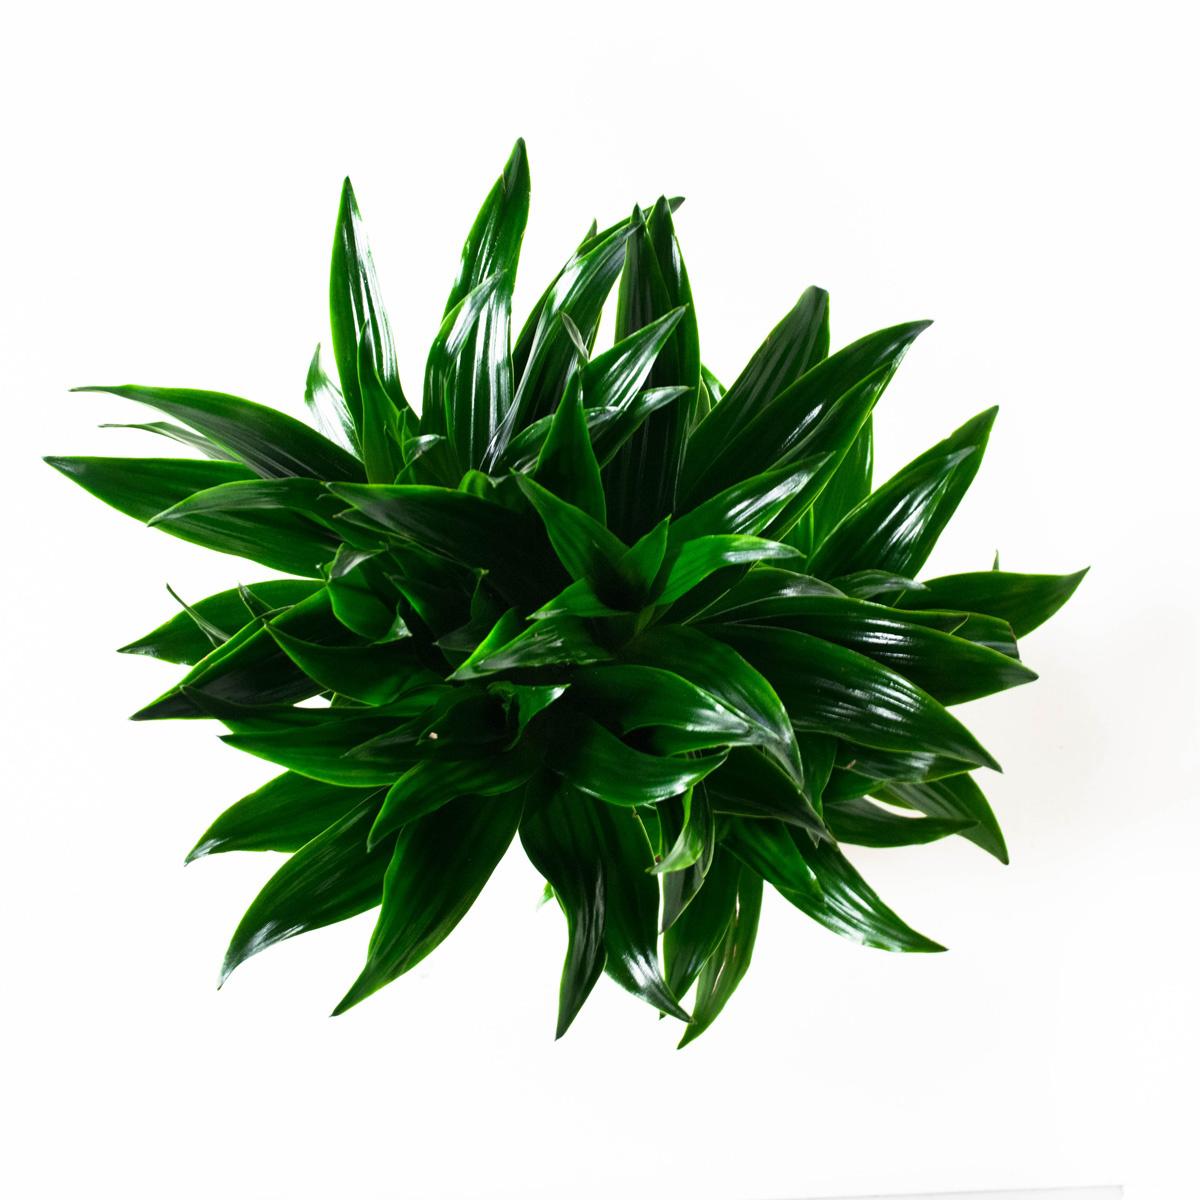 Dracaena fragans janet craig (17x65 cm)